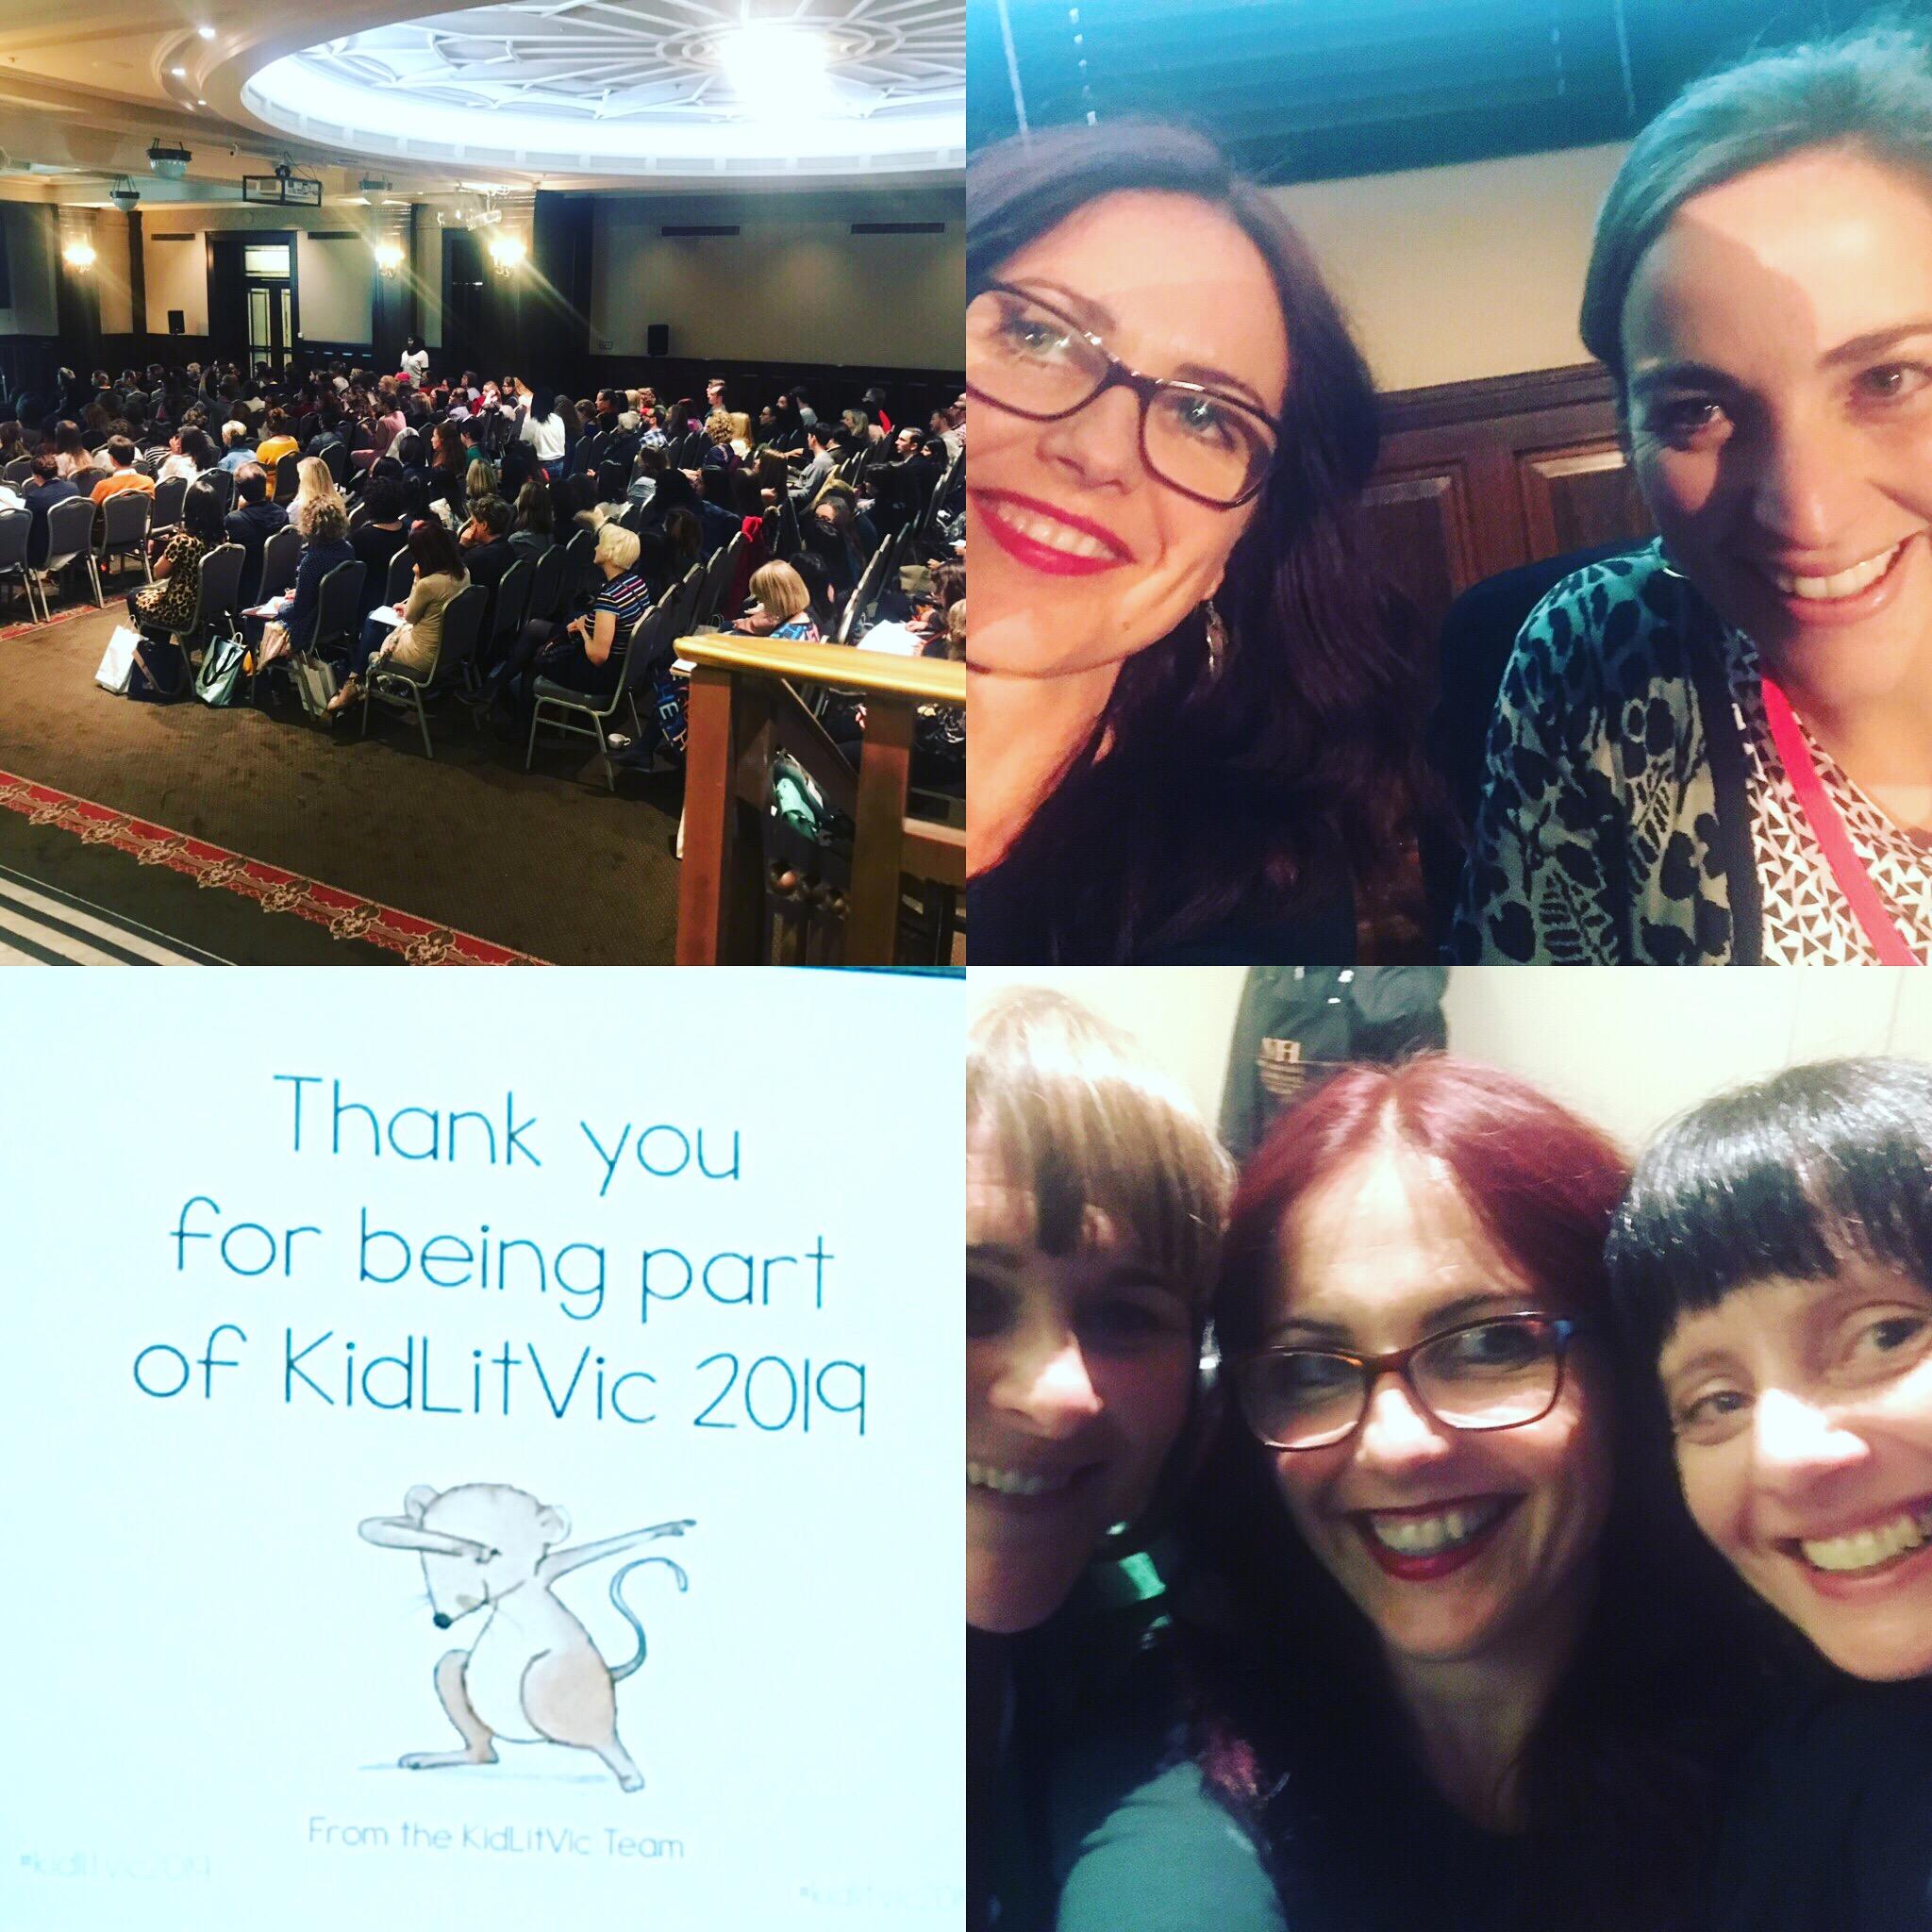 KitLitVic 2019 with Davina Bell, Julia Grasso, myself and Madeleine Jenkins.